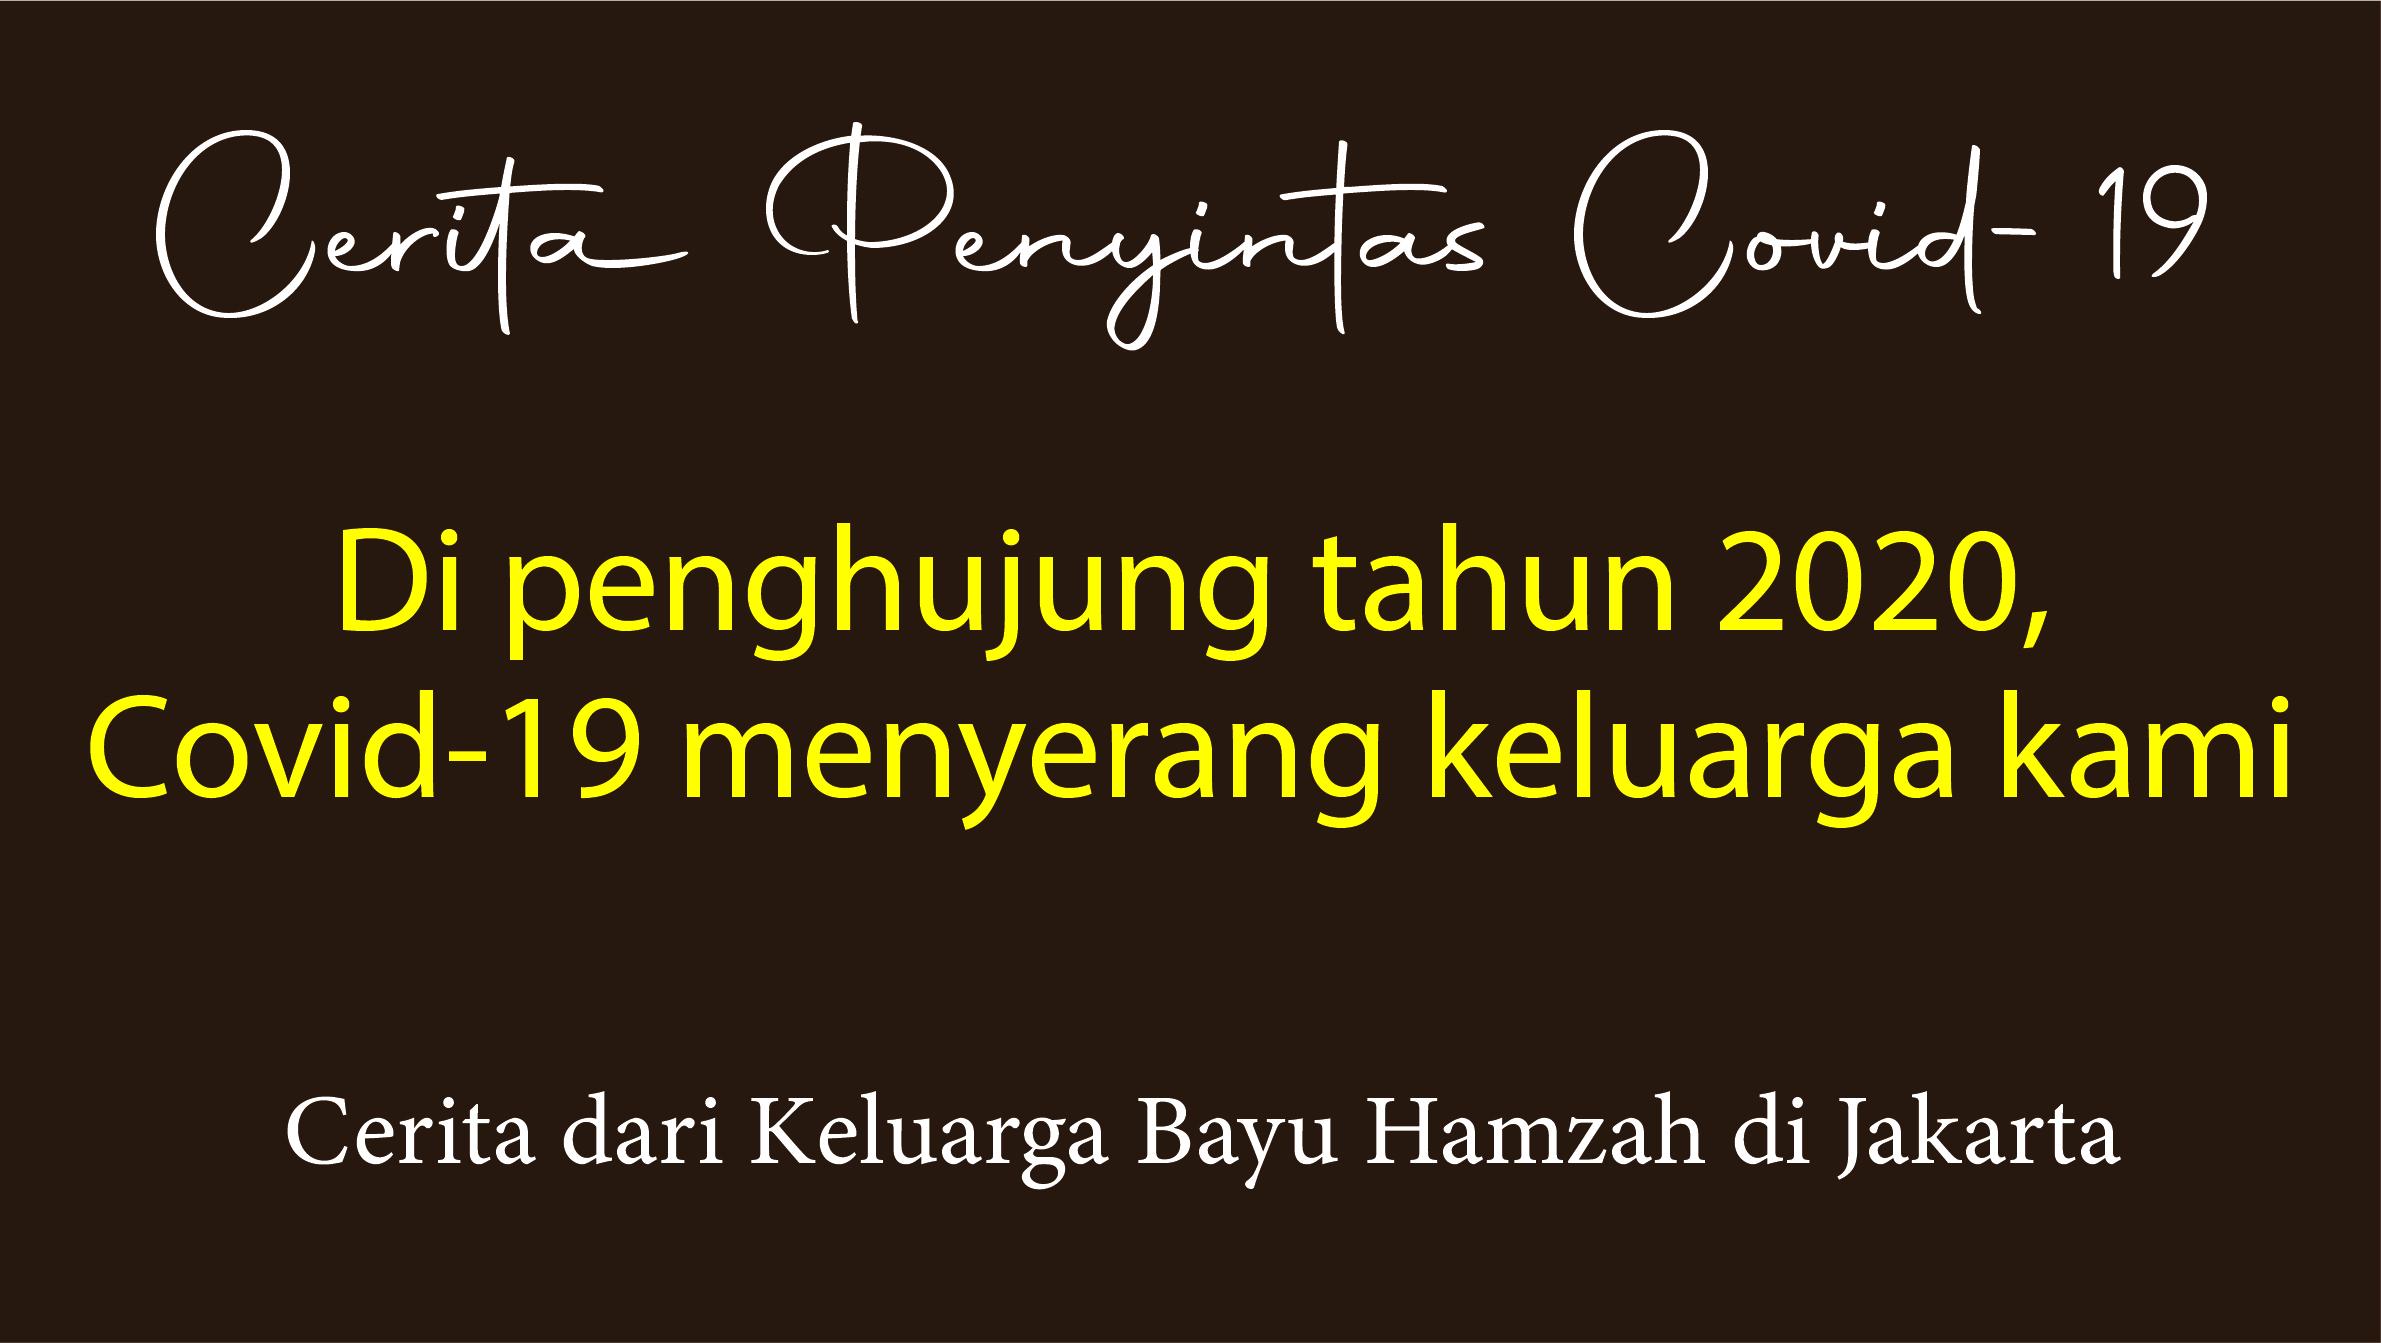 Cerita Penyintas Covid-19: Bayu Hamzah, Jakarta